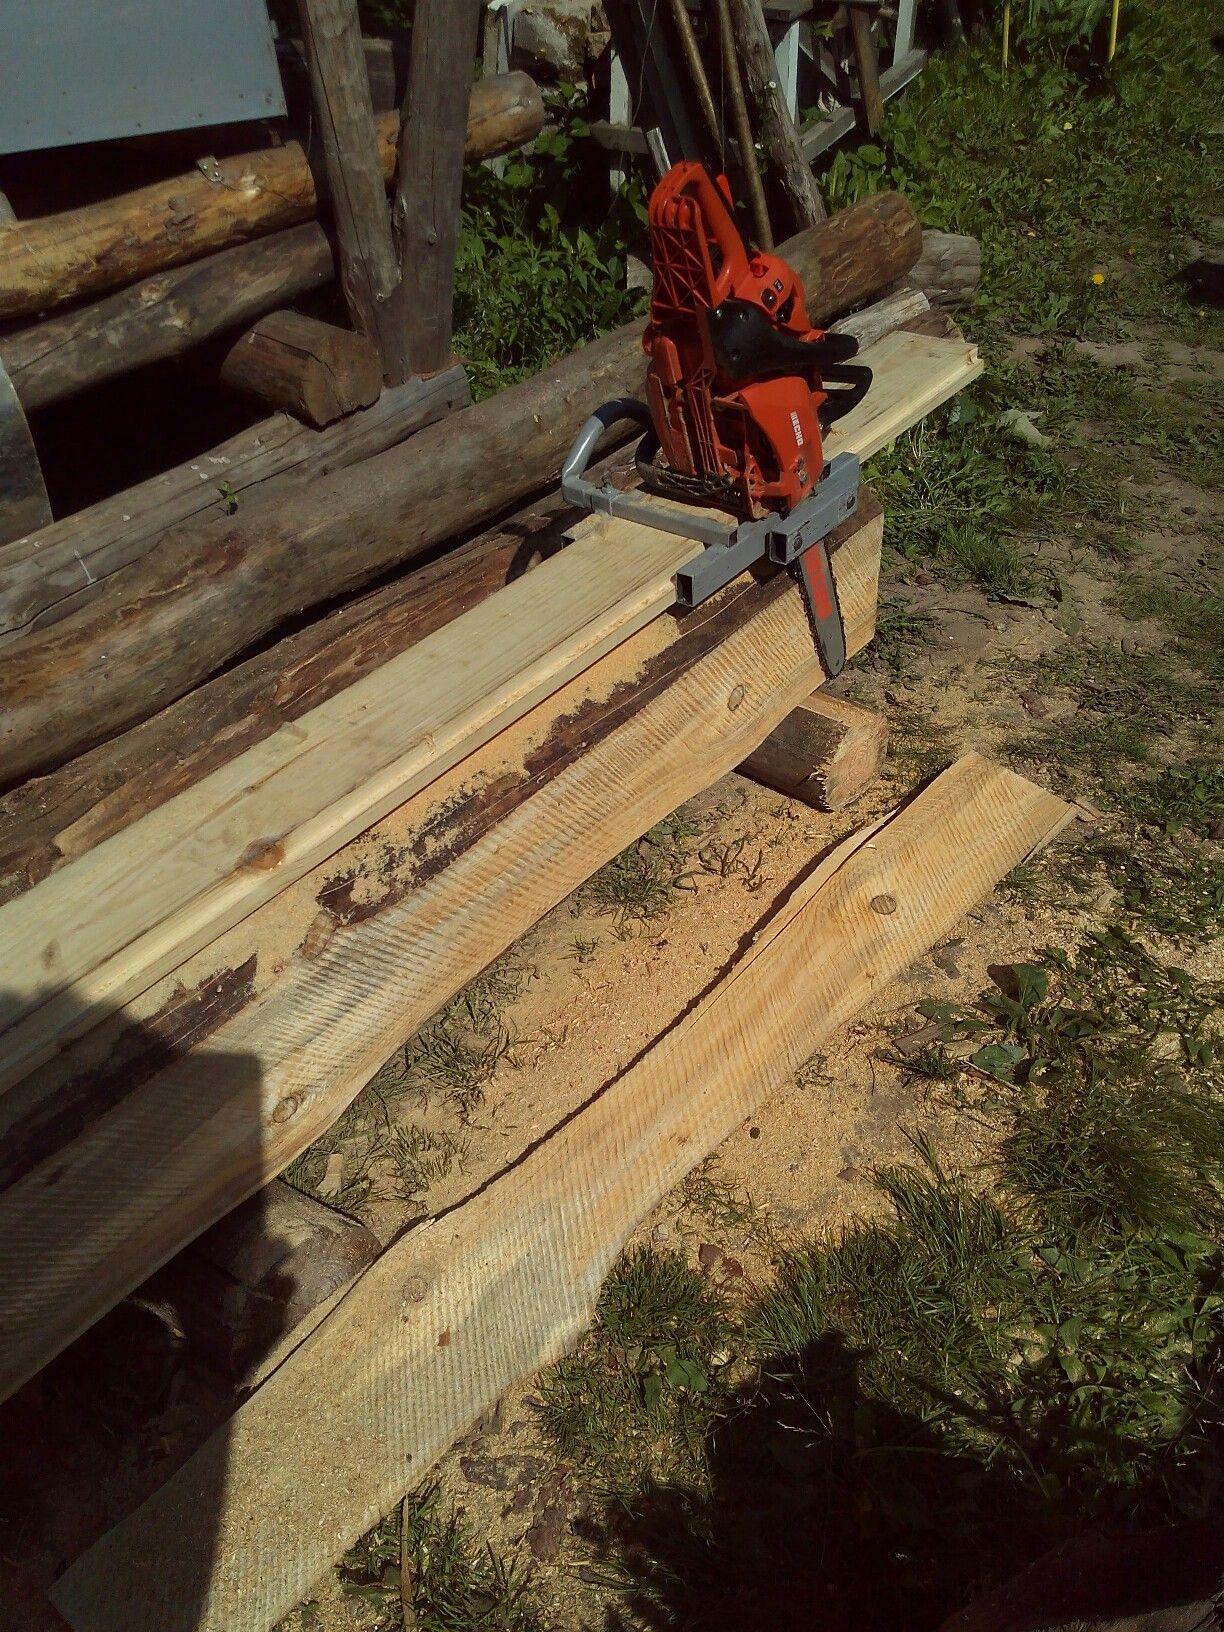 forest sawmill wood lumber amker cut off chain saw attachment board